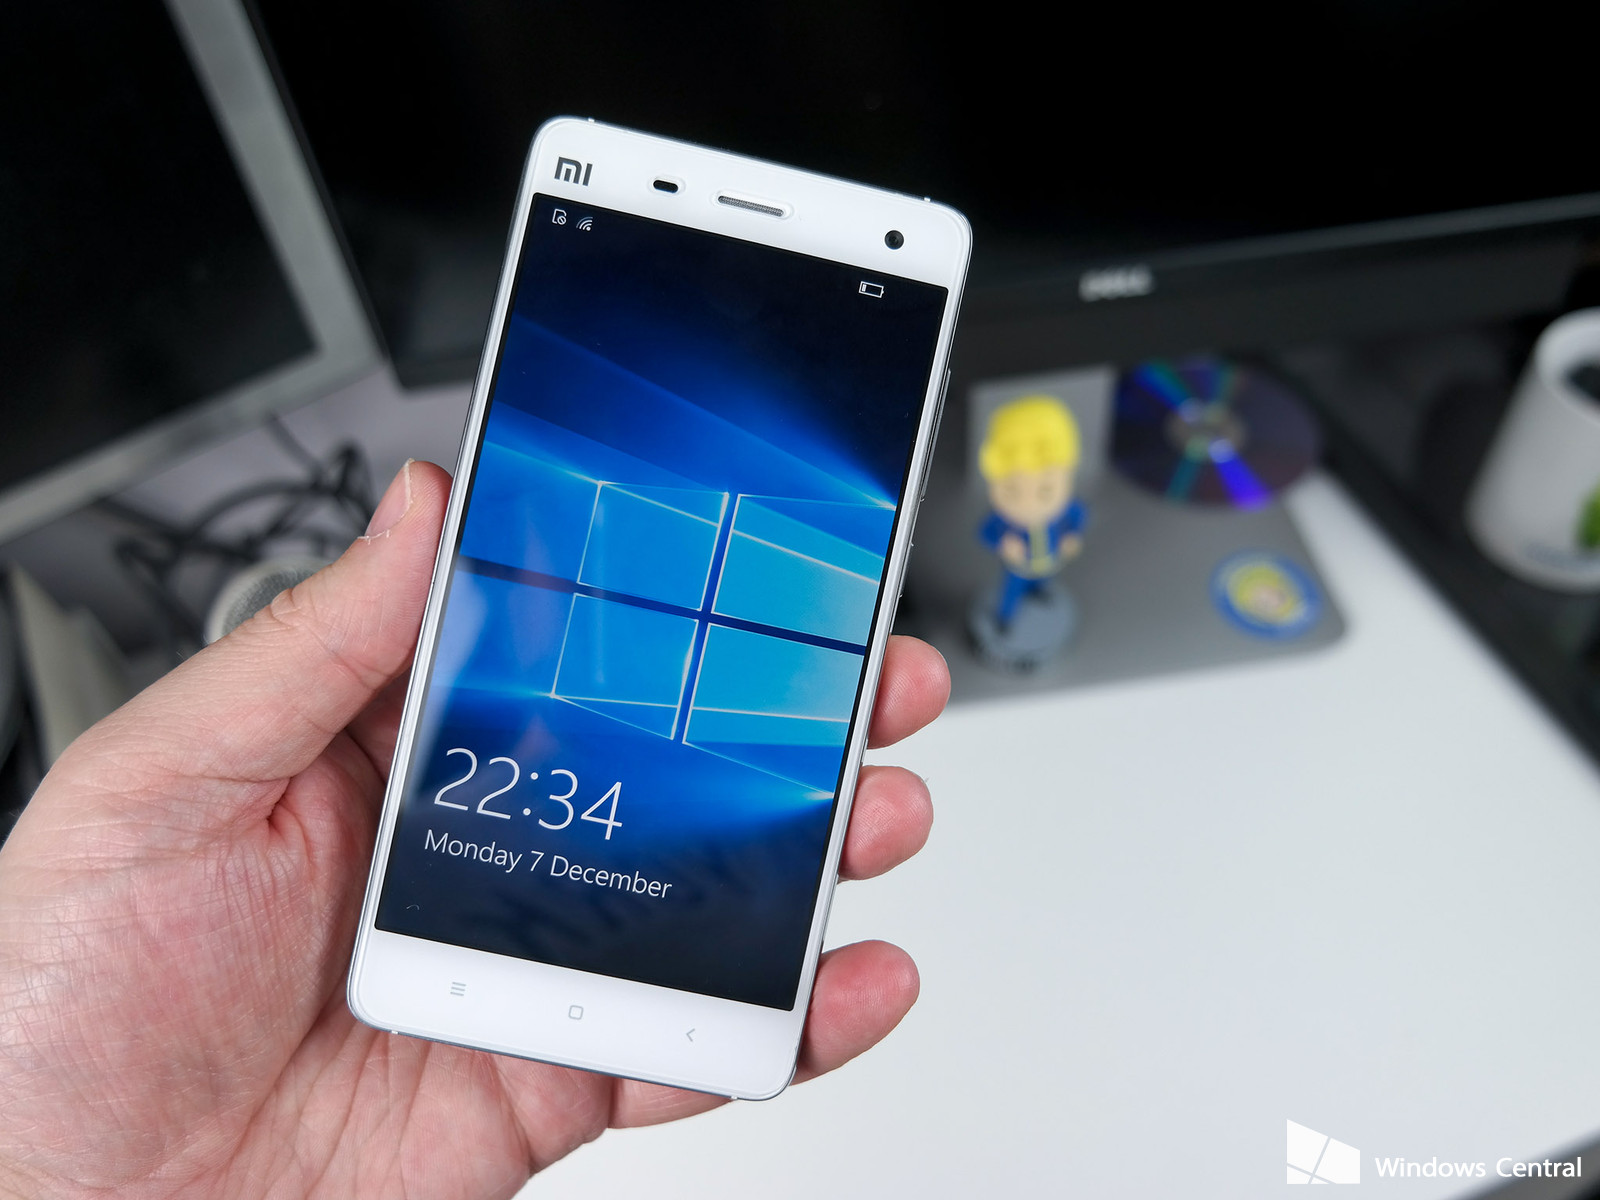 xiaomi mi4 windows 10 lockscreen